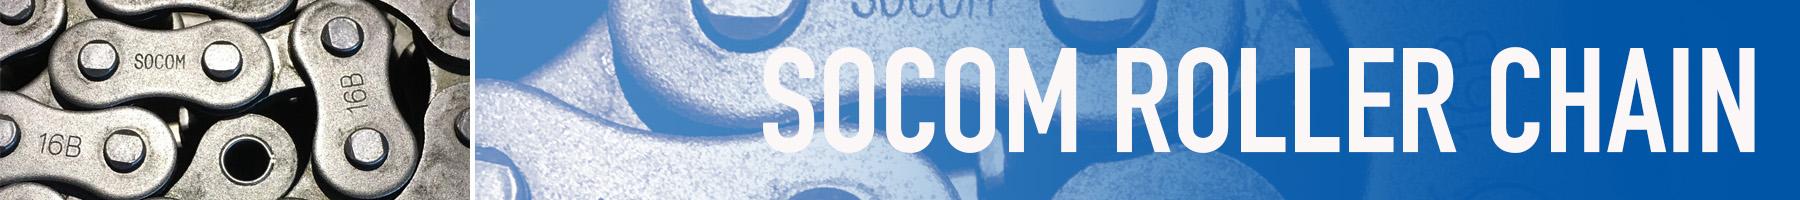 SOCOM Roller Chain-Blue 1800x200px